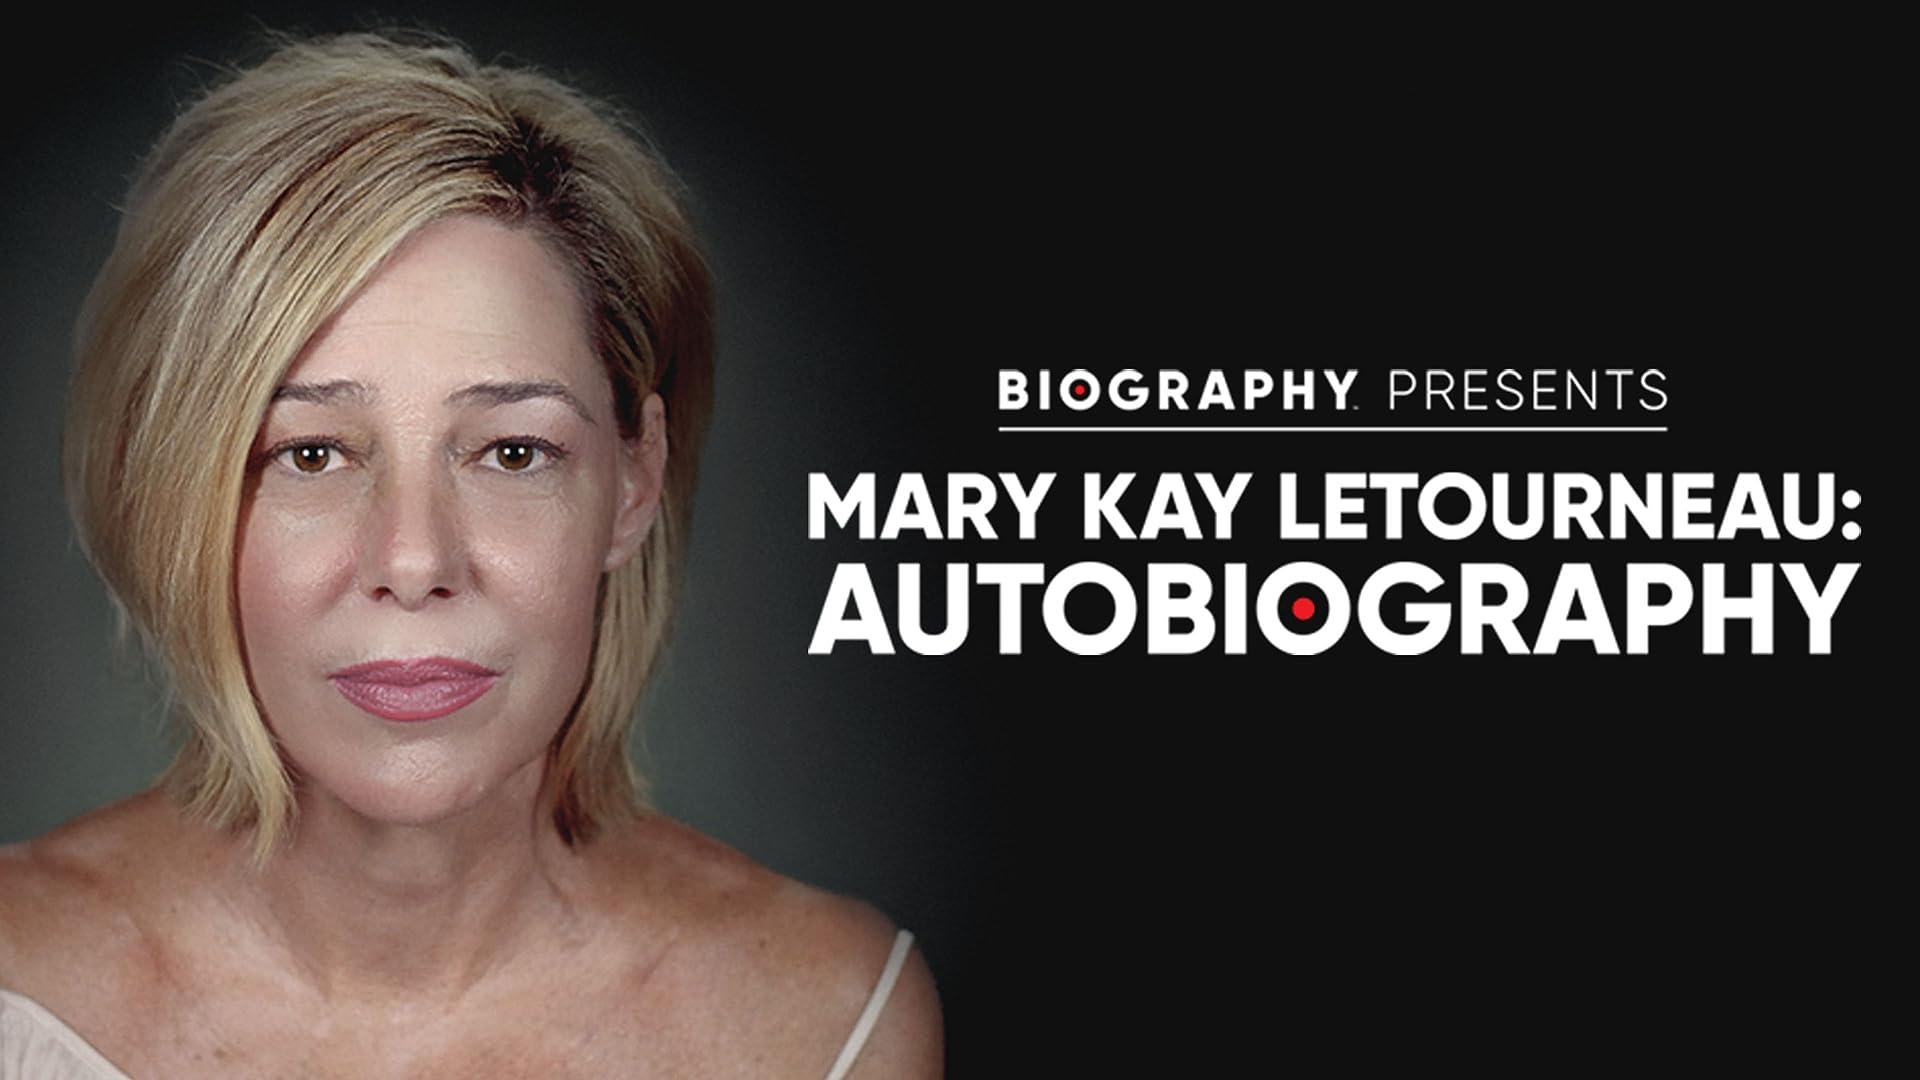 Mary Kay Letourneau: Autobiography HD